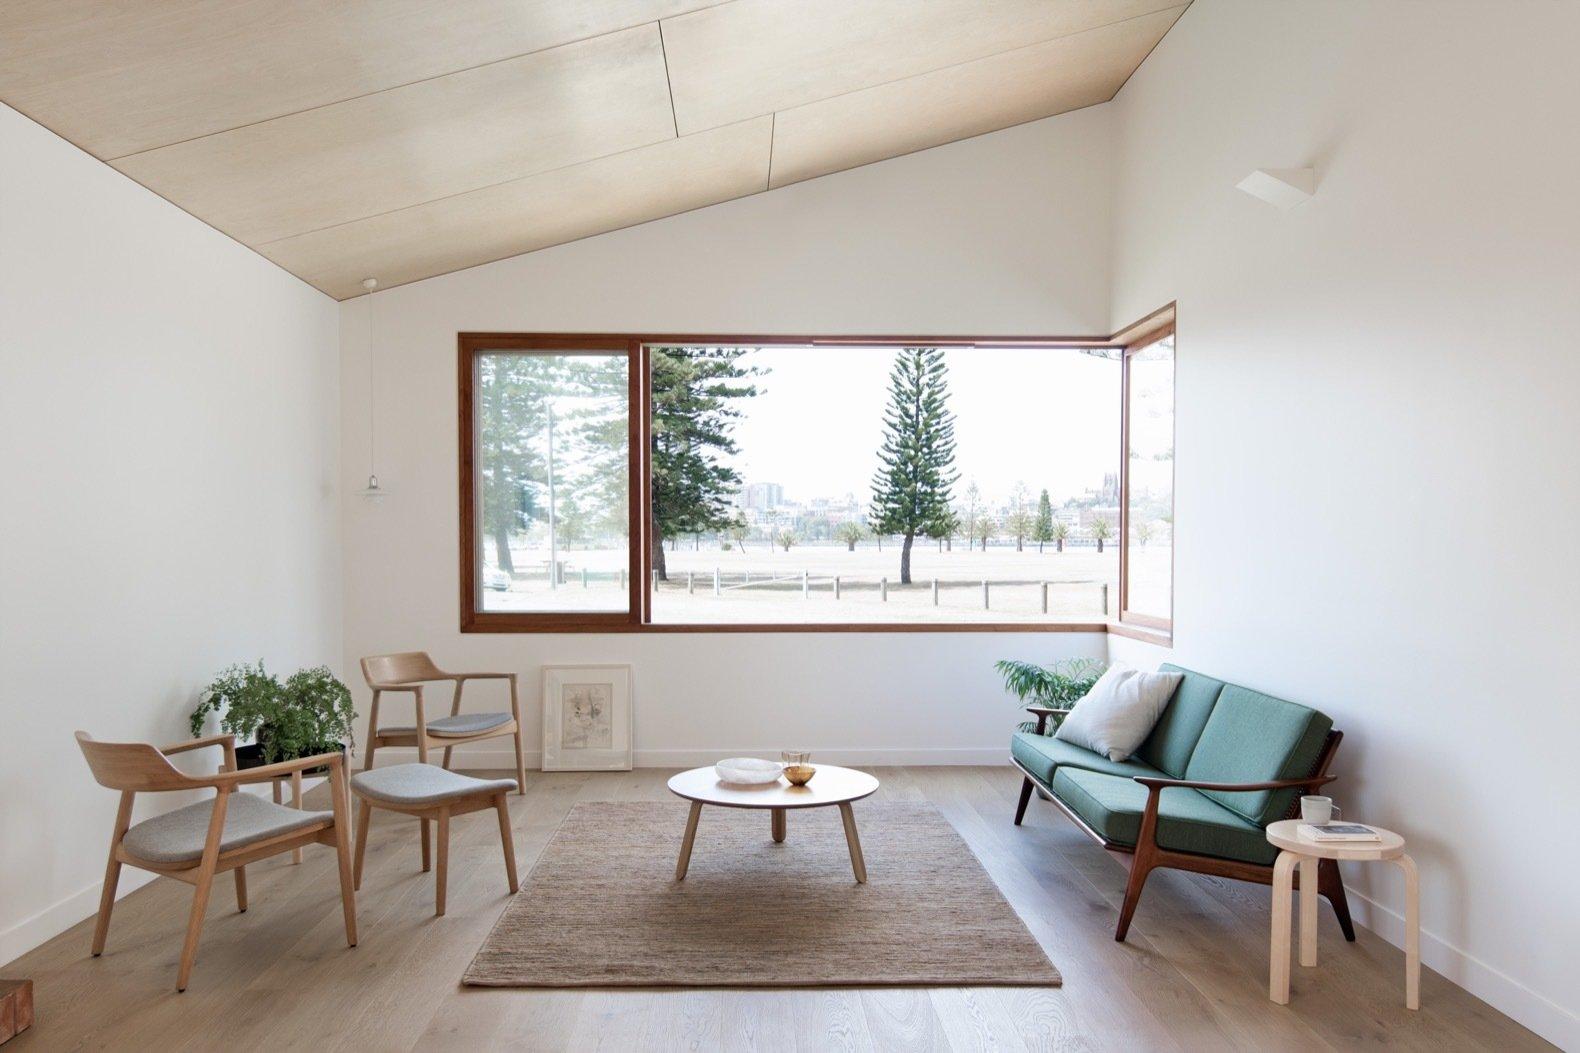 Three Piece House living room with corner window